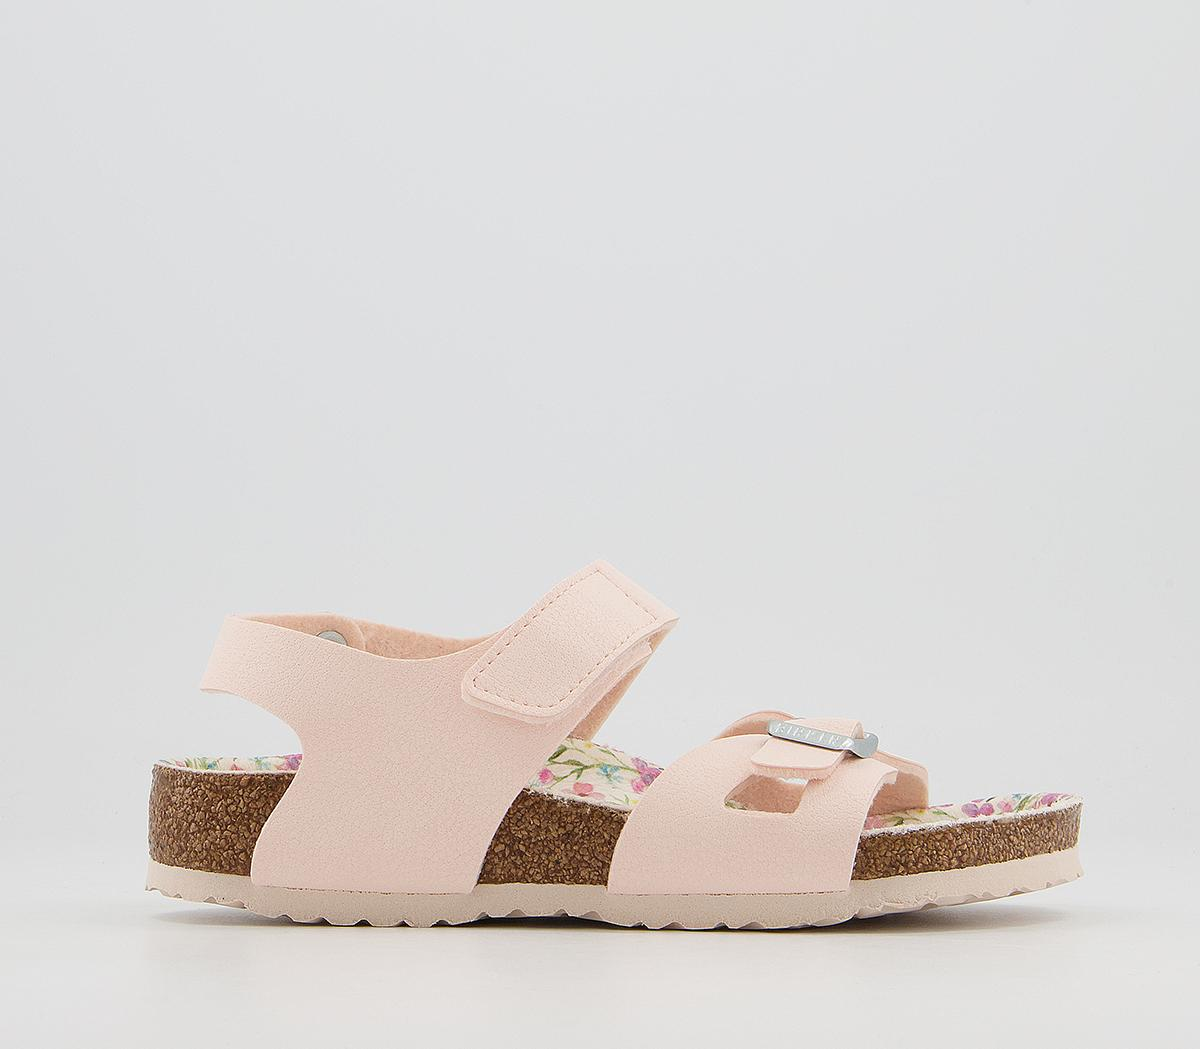 Colorado Kids Sandals